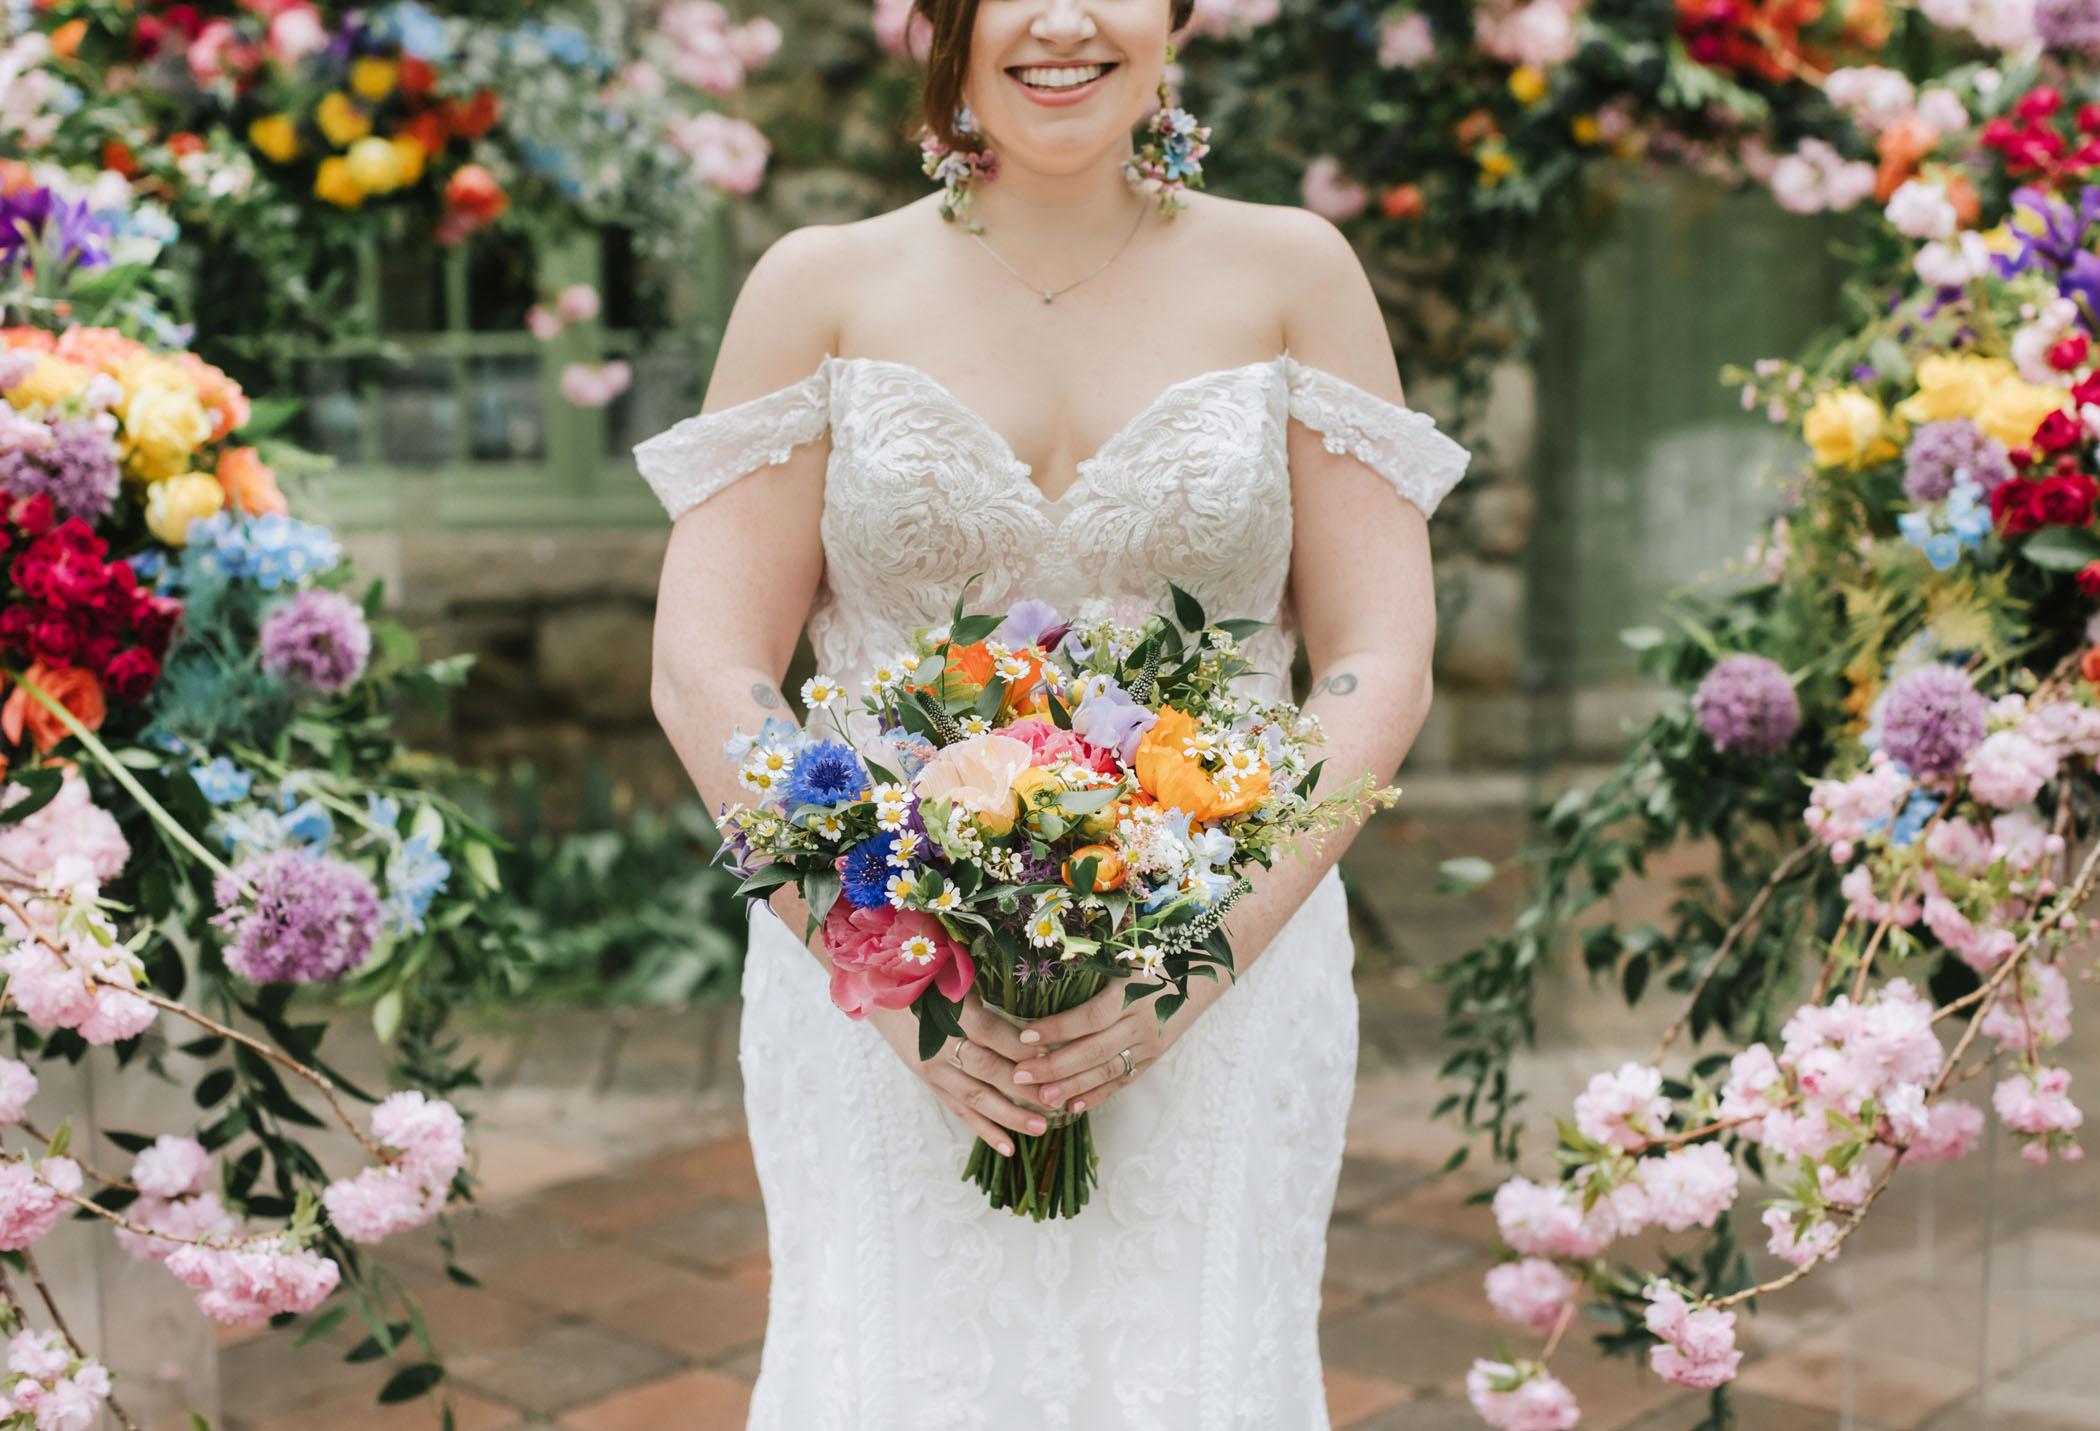 bright-wedding-color-ideas-bouquet